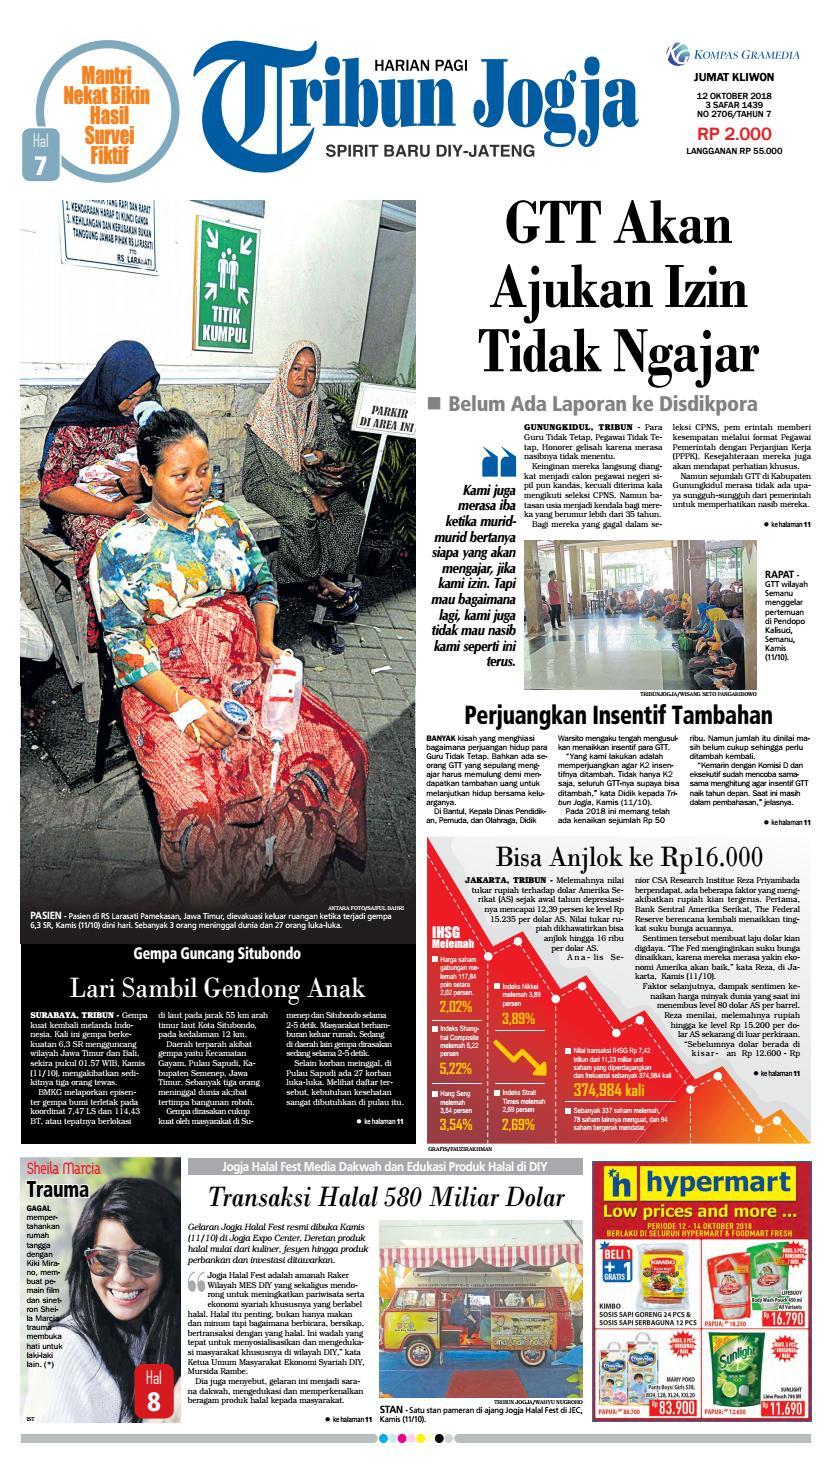 Tribun Jogja 12 10 2018 By Issuu Produk Ukm Bumn Wisata Mewah Bali 3hr 2mlm